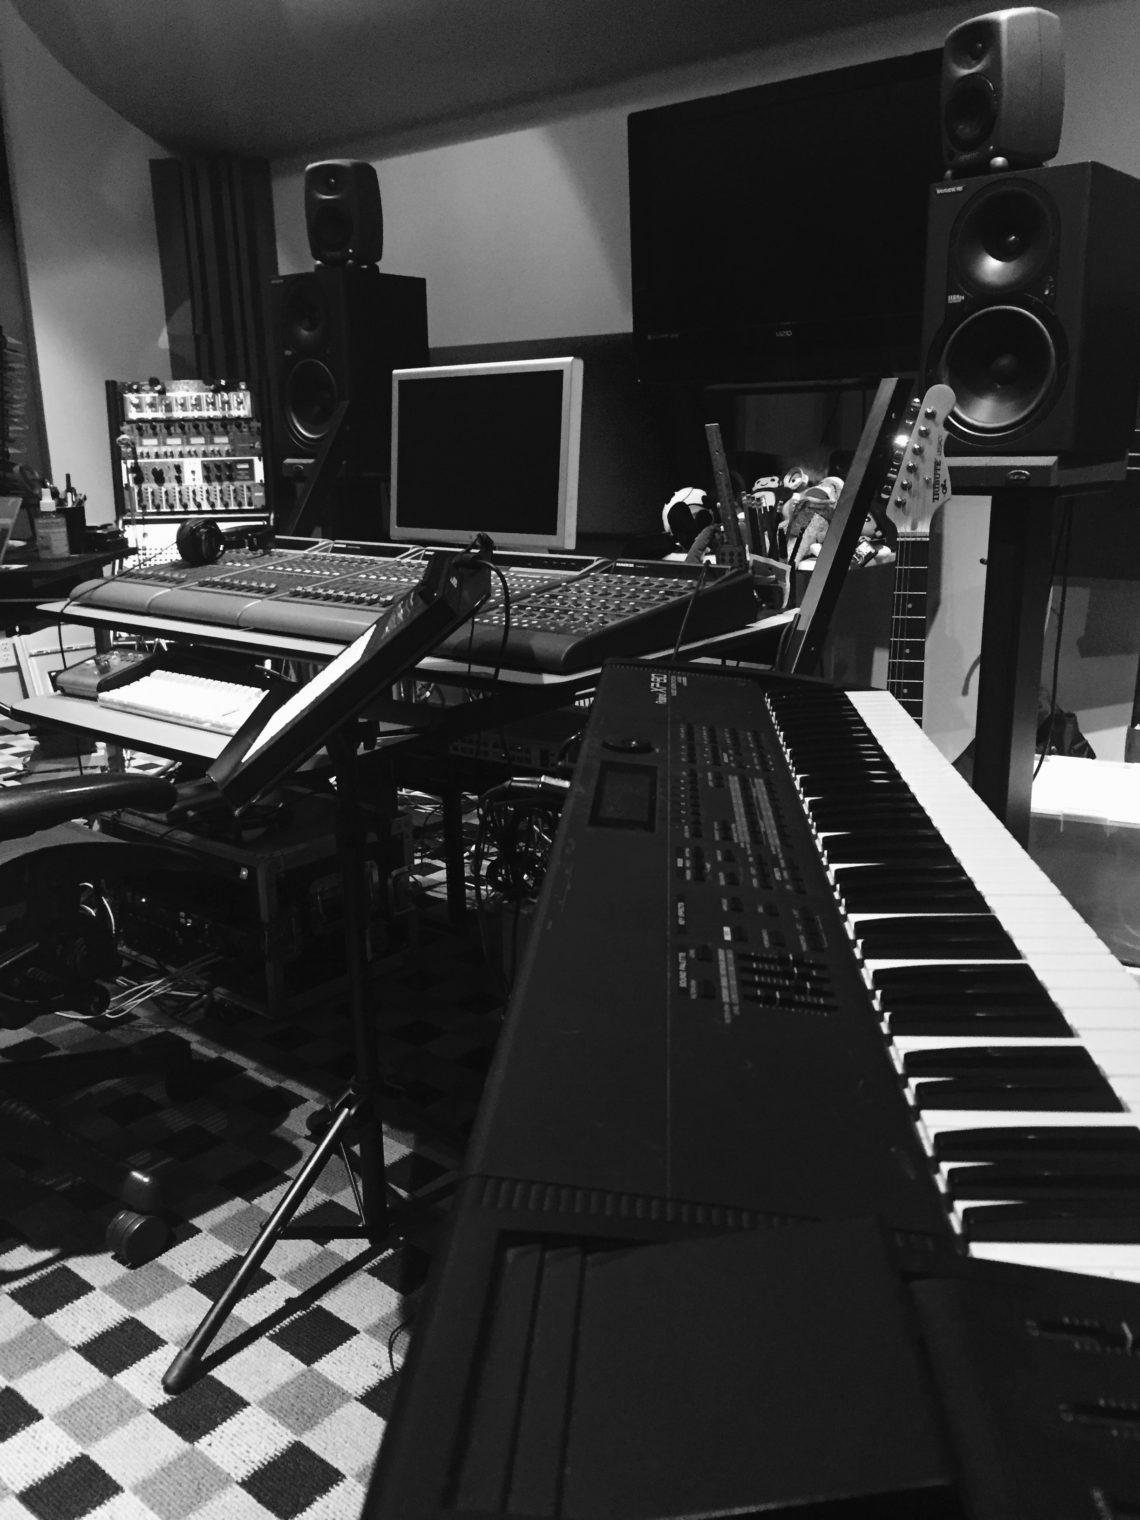 Creative Studio Space